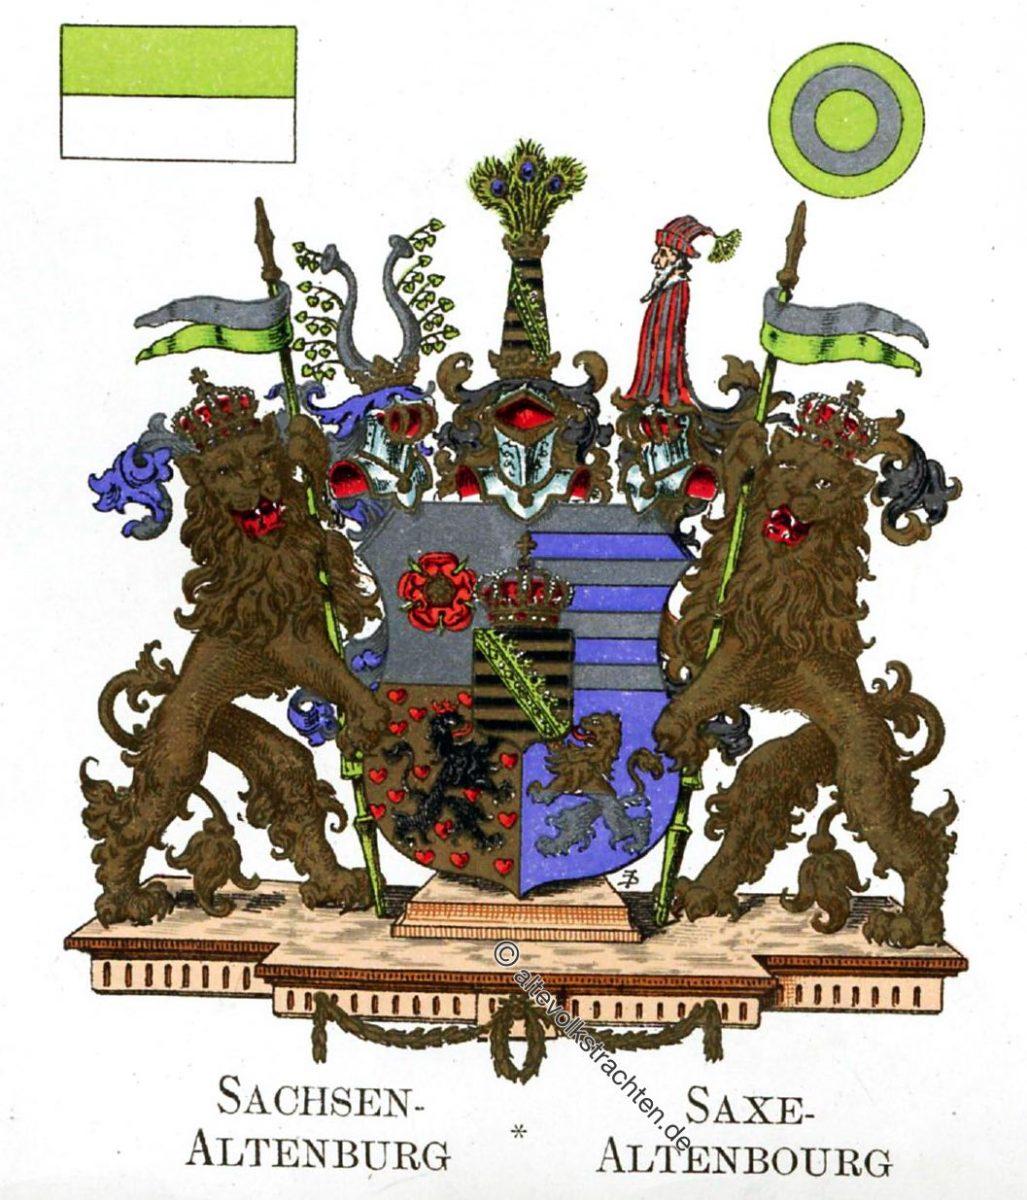 Sachsen-Altenburg, Staatswappen, Wappen, Heraldik, Deutschland, Landesflaggen, Cocarden,